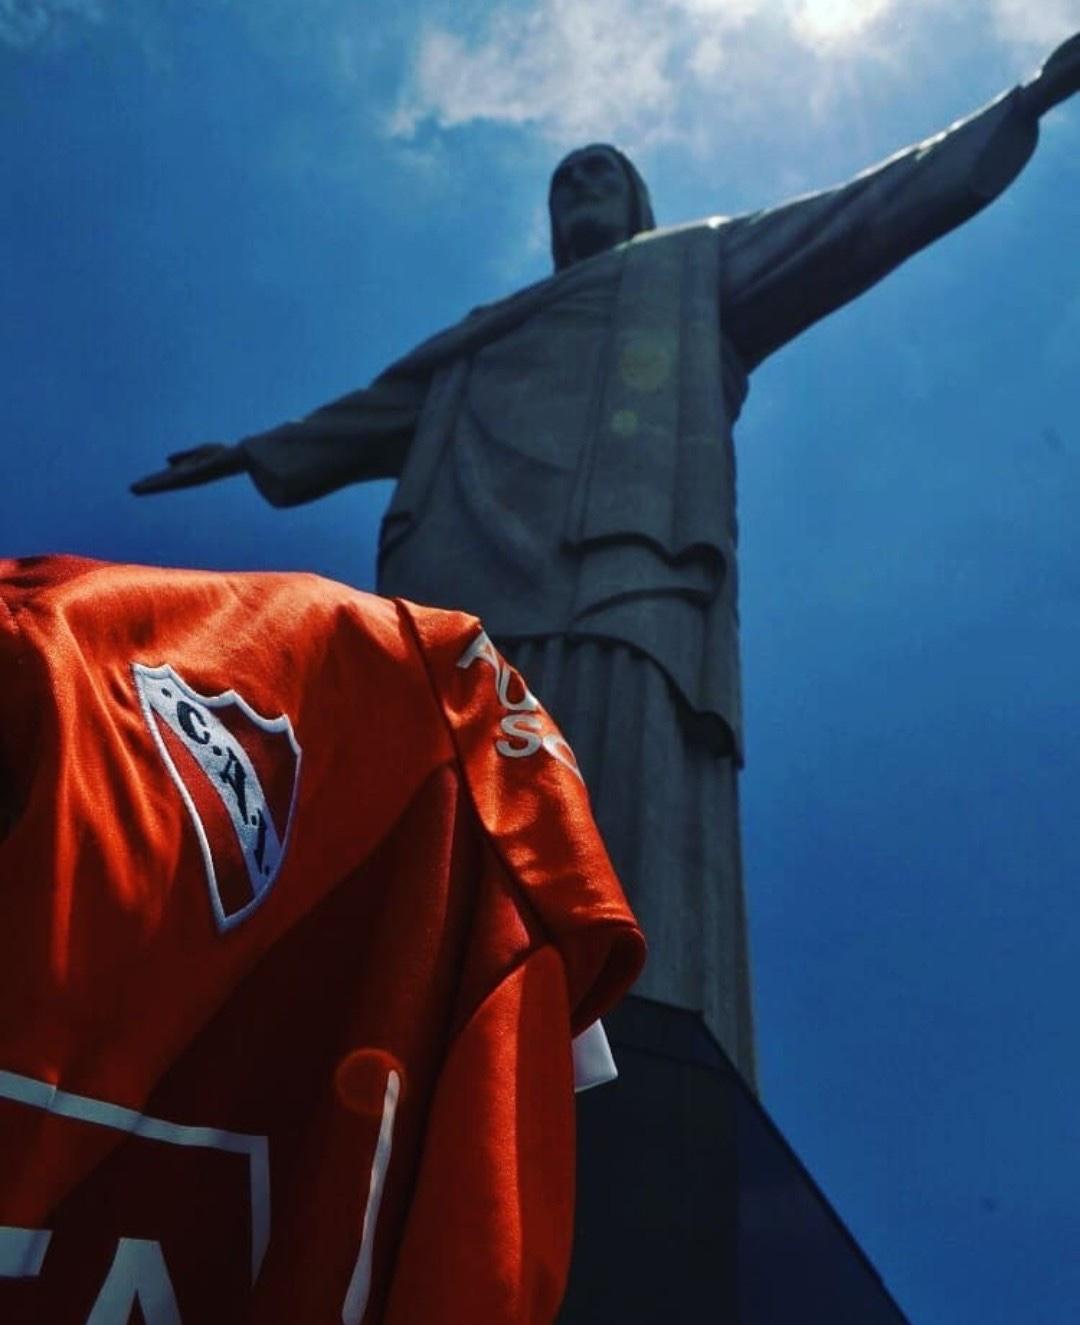 Independiente – SPROFONDO ROSSO